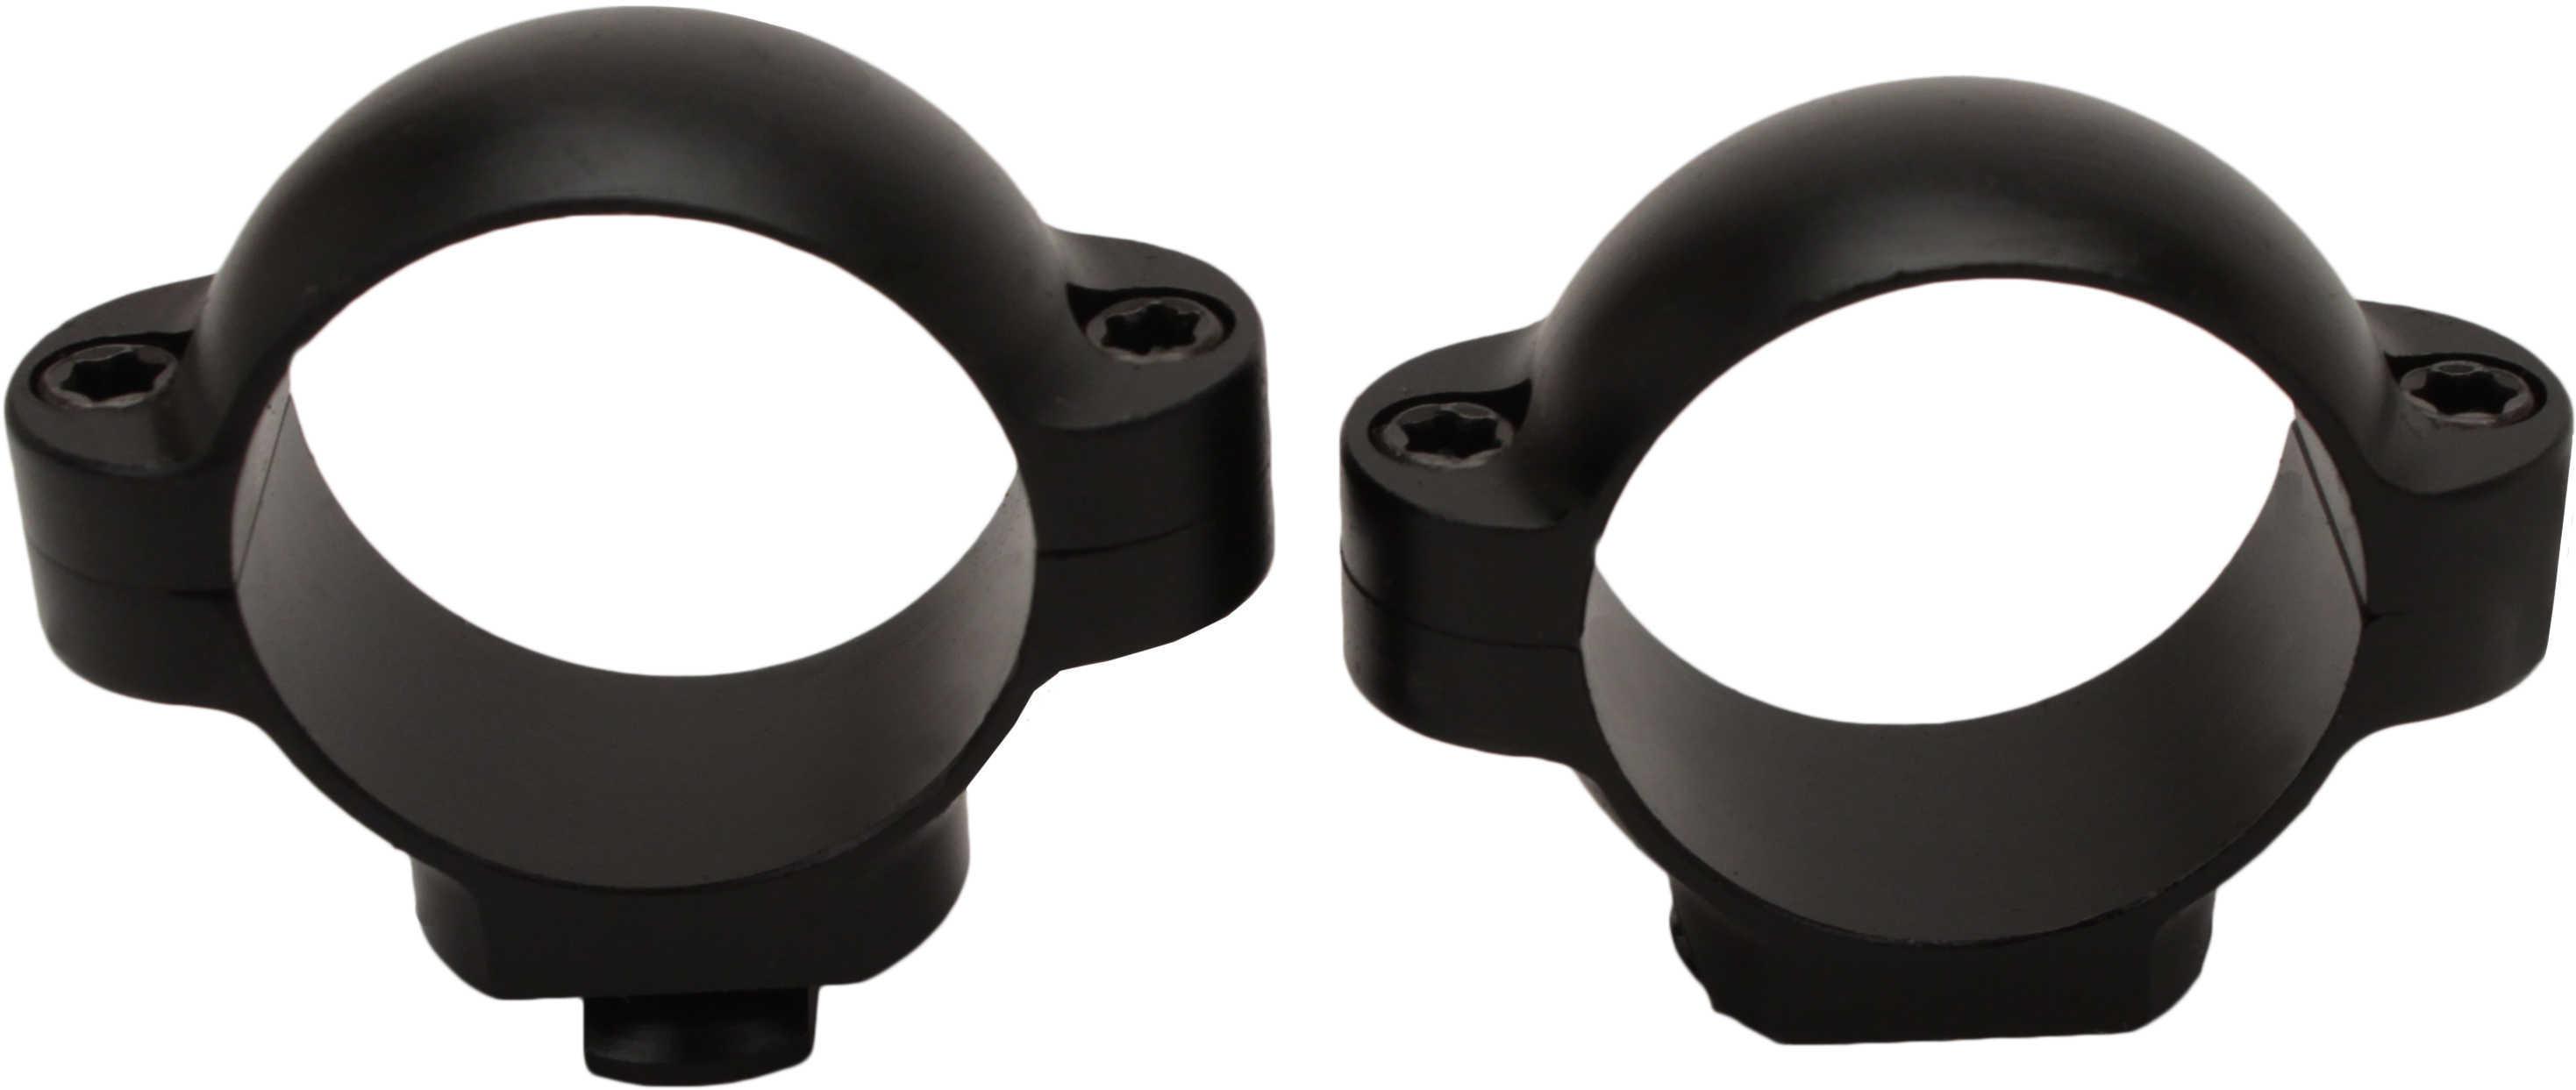 "Burris Standard 1"" Rings Low Black Matte Md: 420012"